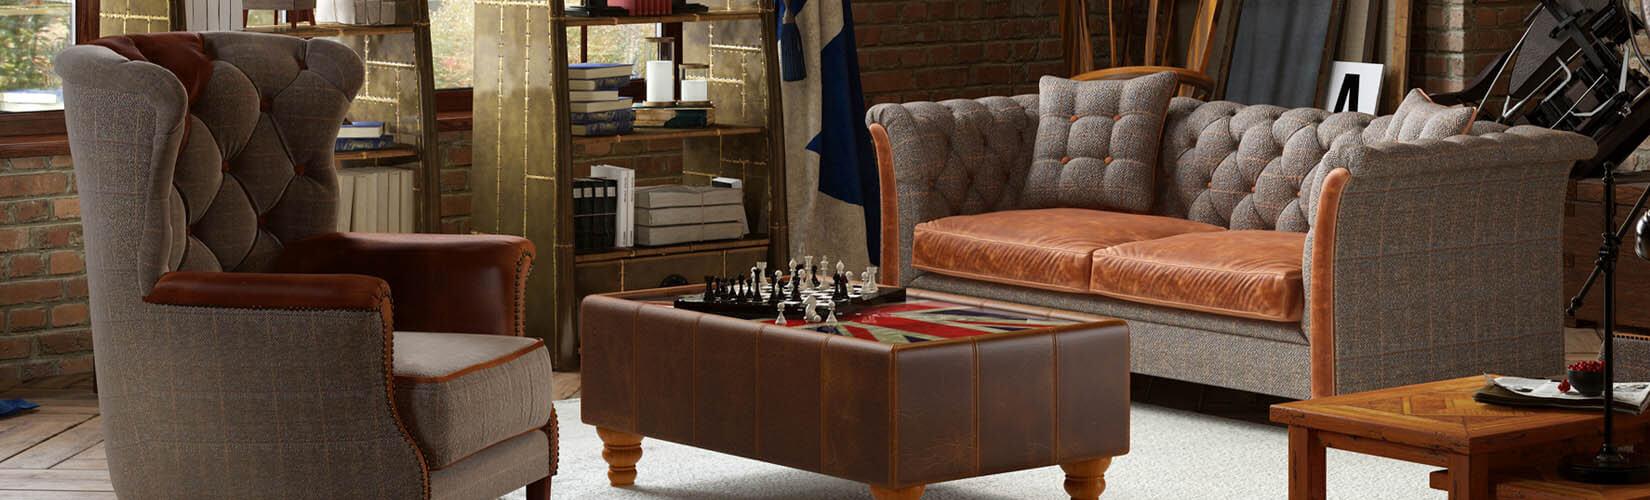 Carlton Furniture & Vintage Sofa Company: Brand Focus